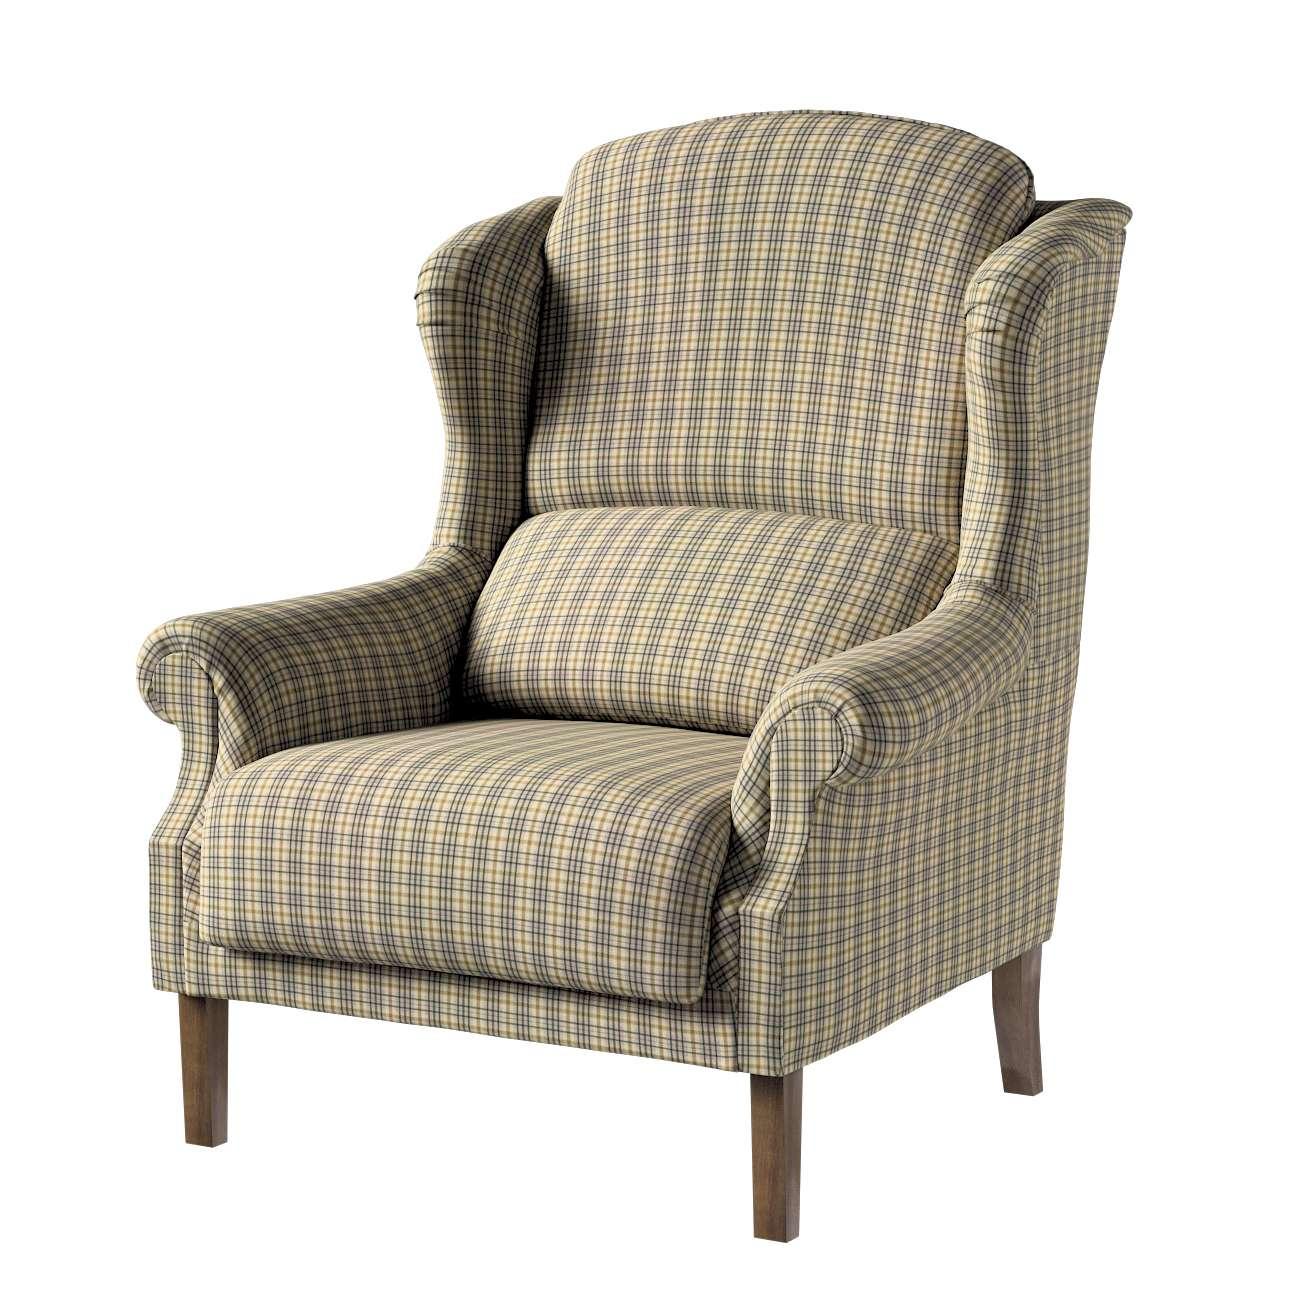 Fotel Unique w kolekcji Londres, tkanina: 143-39